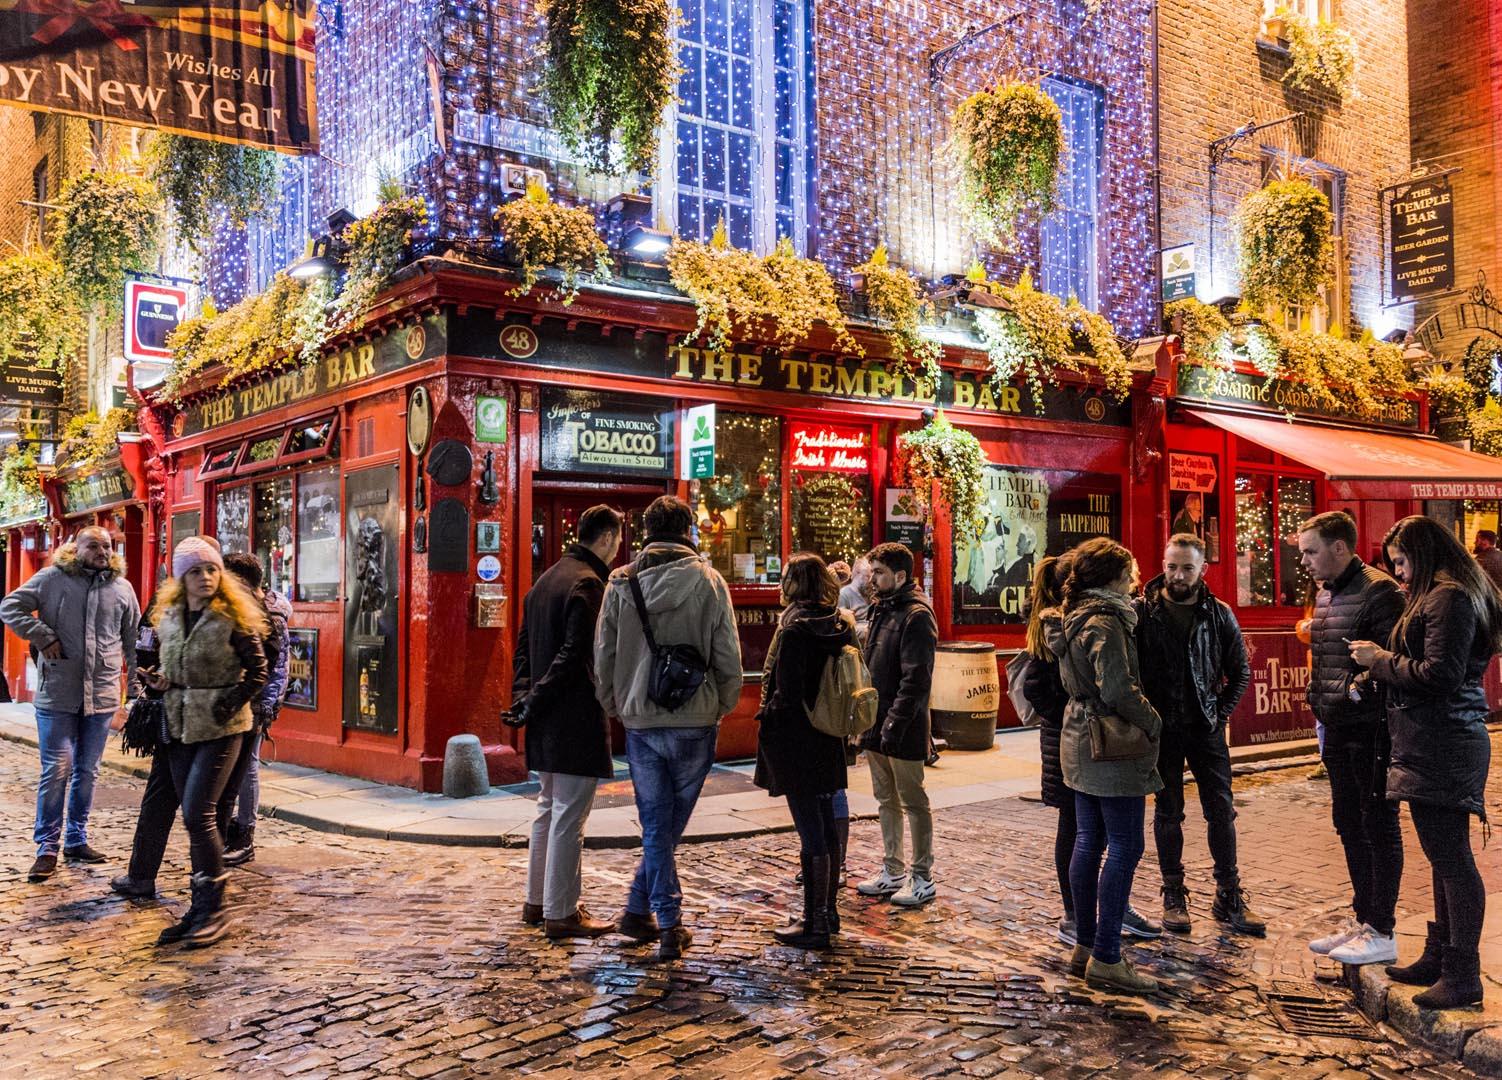 Dublin attractions - Temple Bar